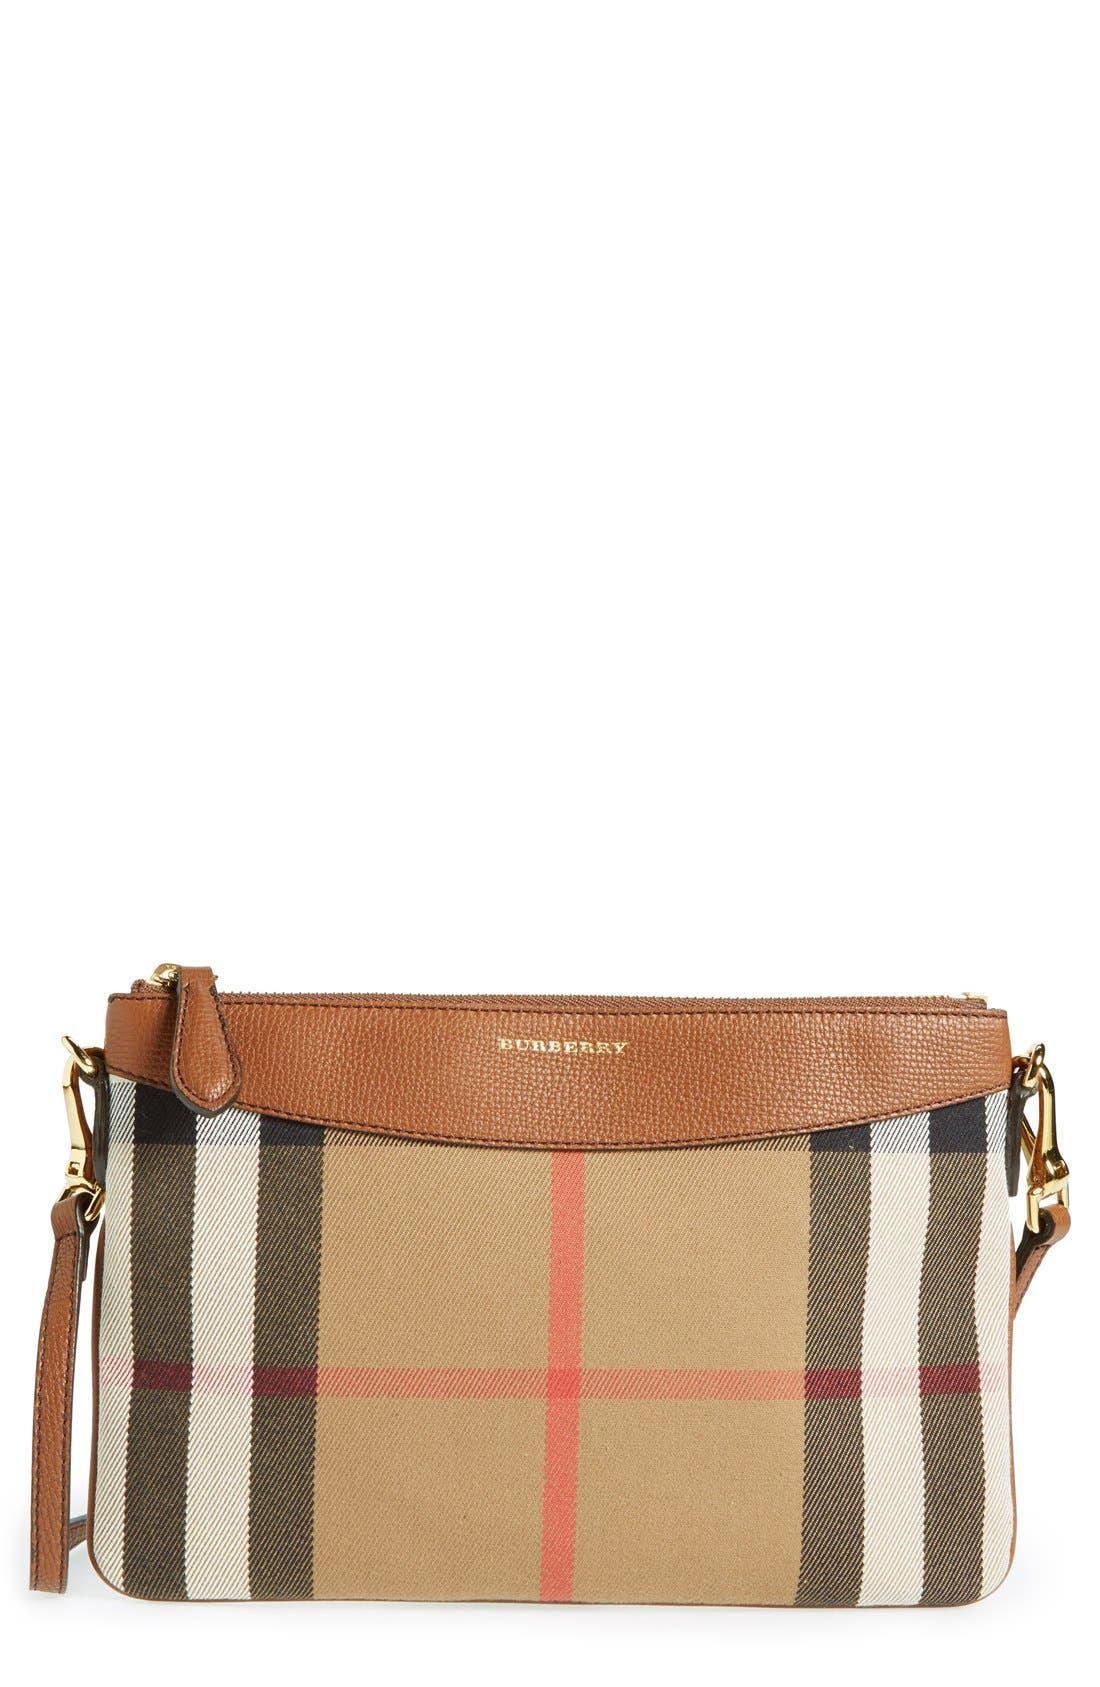 Alternate Image 1 Selected - Burberry 'Peyton - House Check' Crossbody Bag